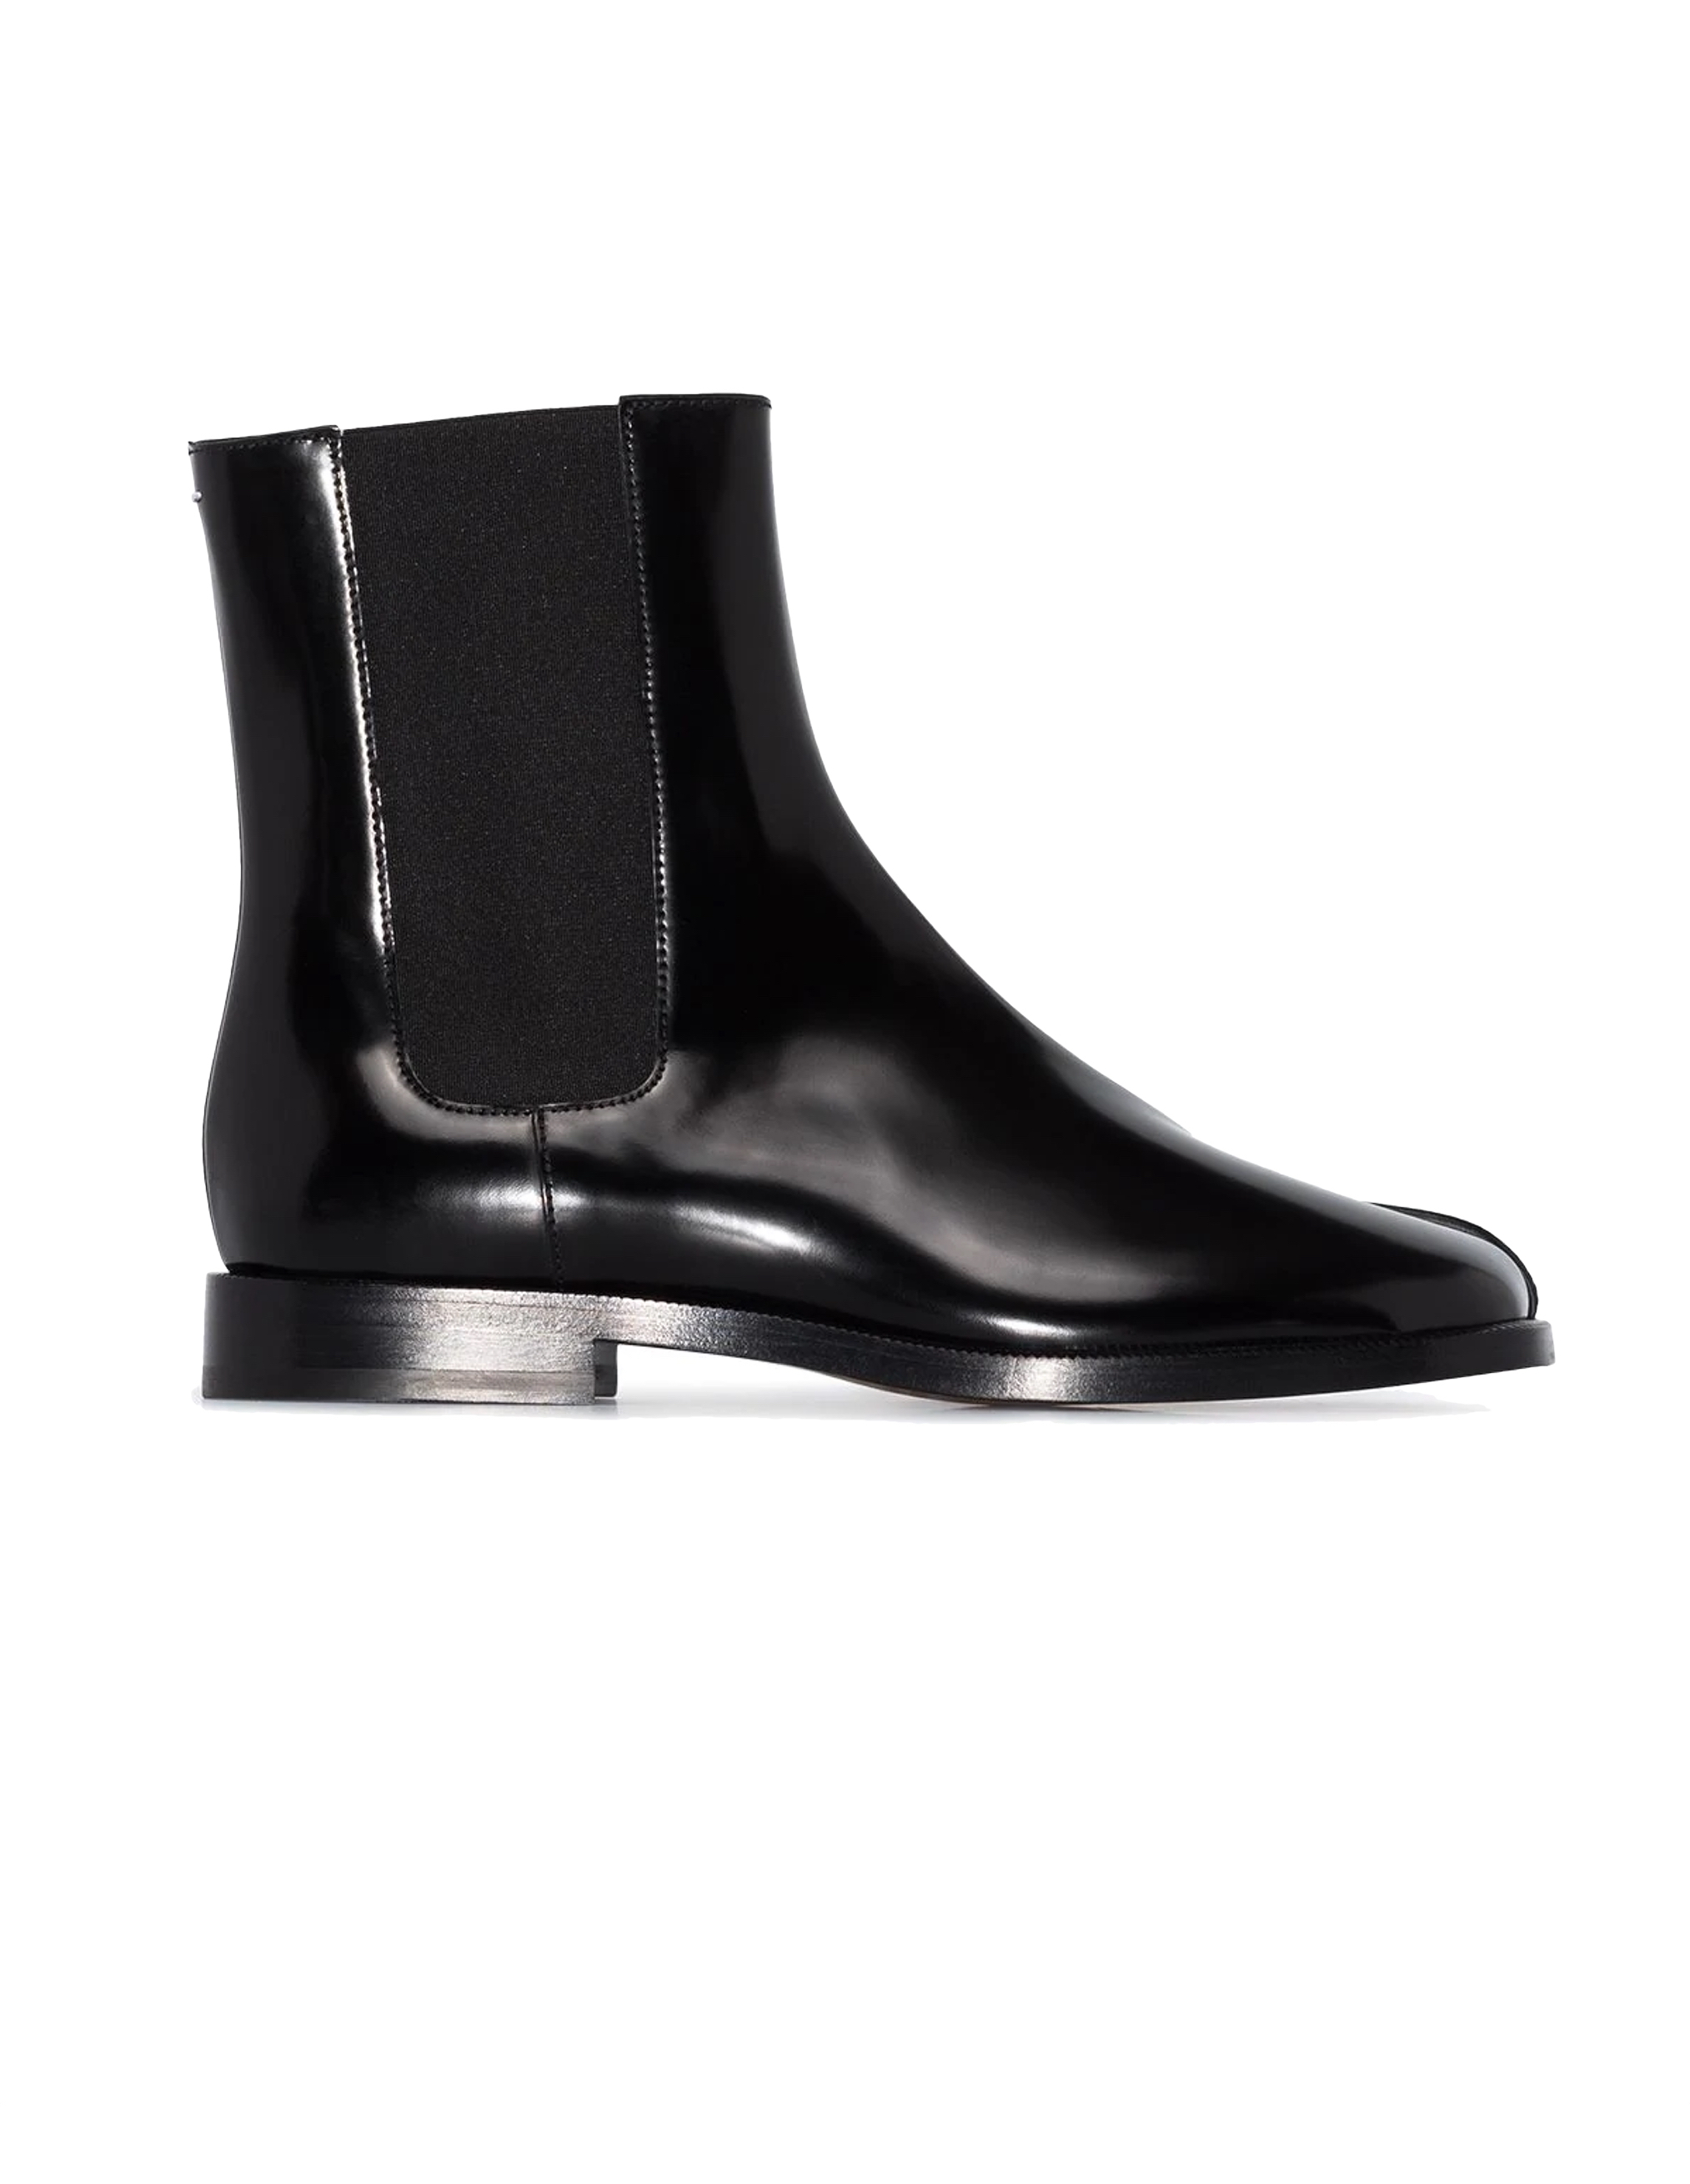 Maison Margiela Black Patent Leather Tabi Boots